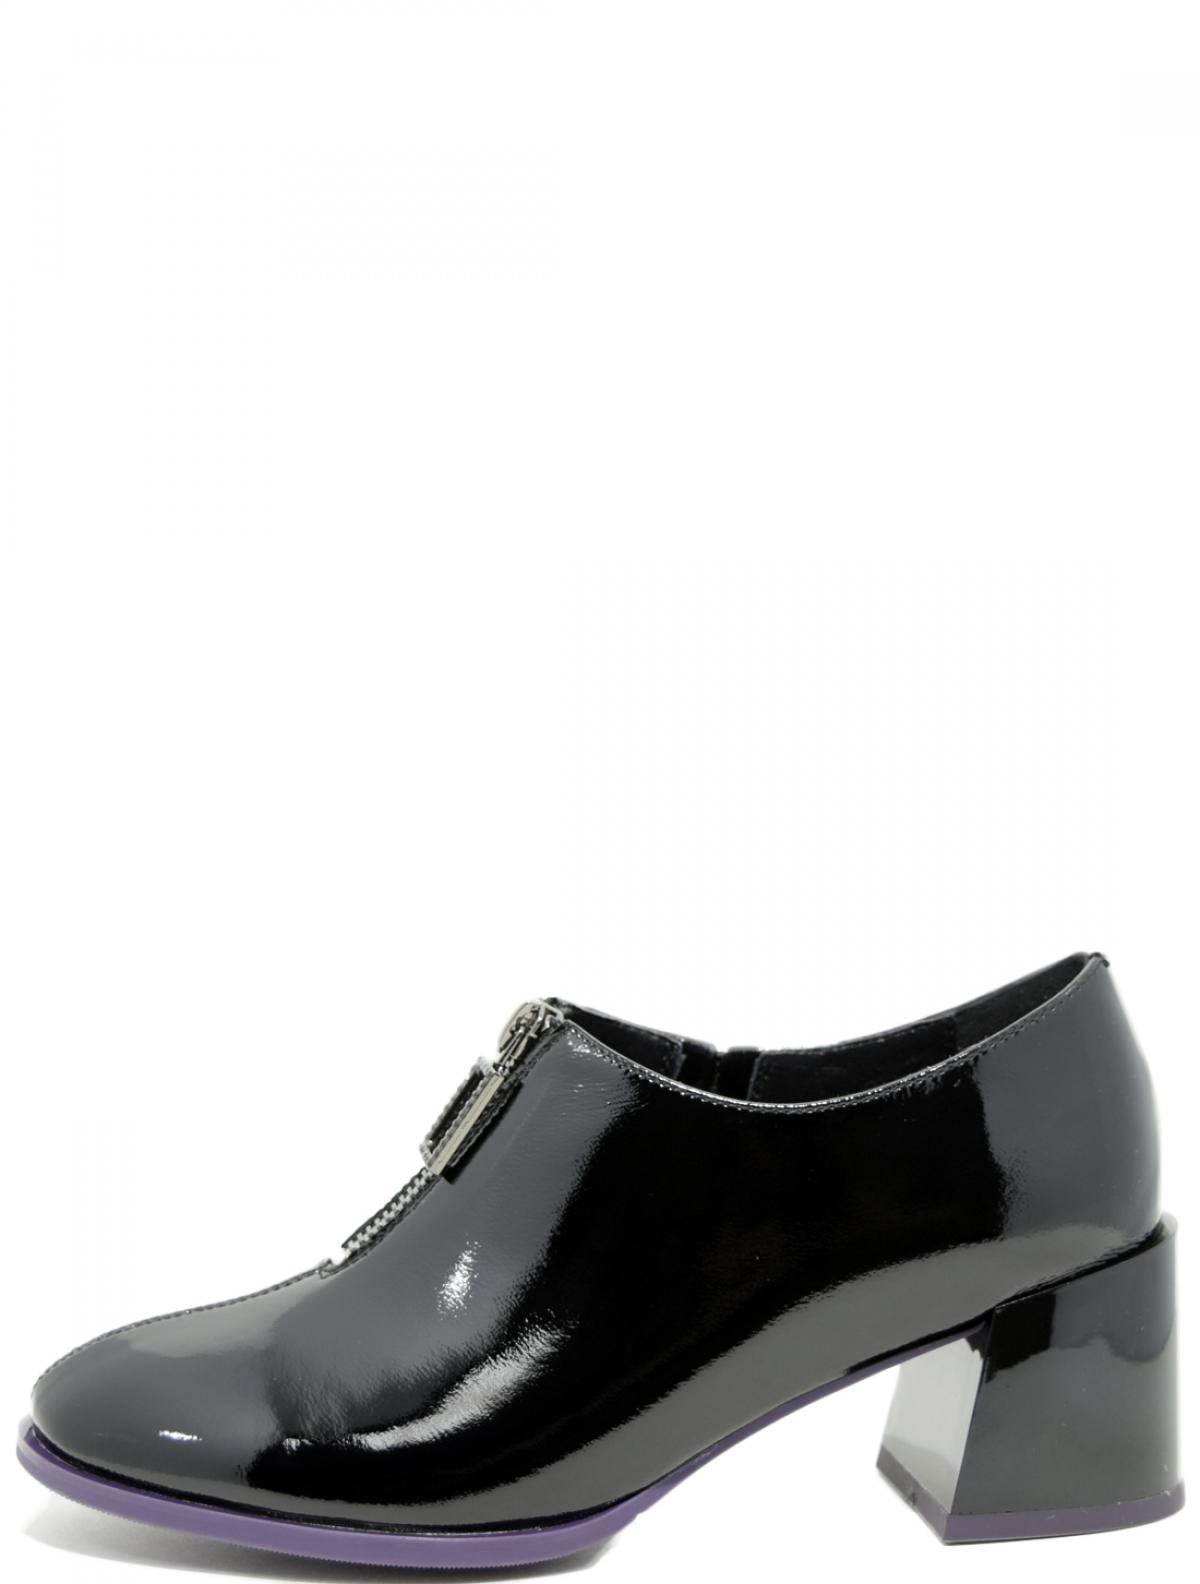 Respect VS74-126077 женские туфли